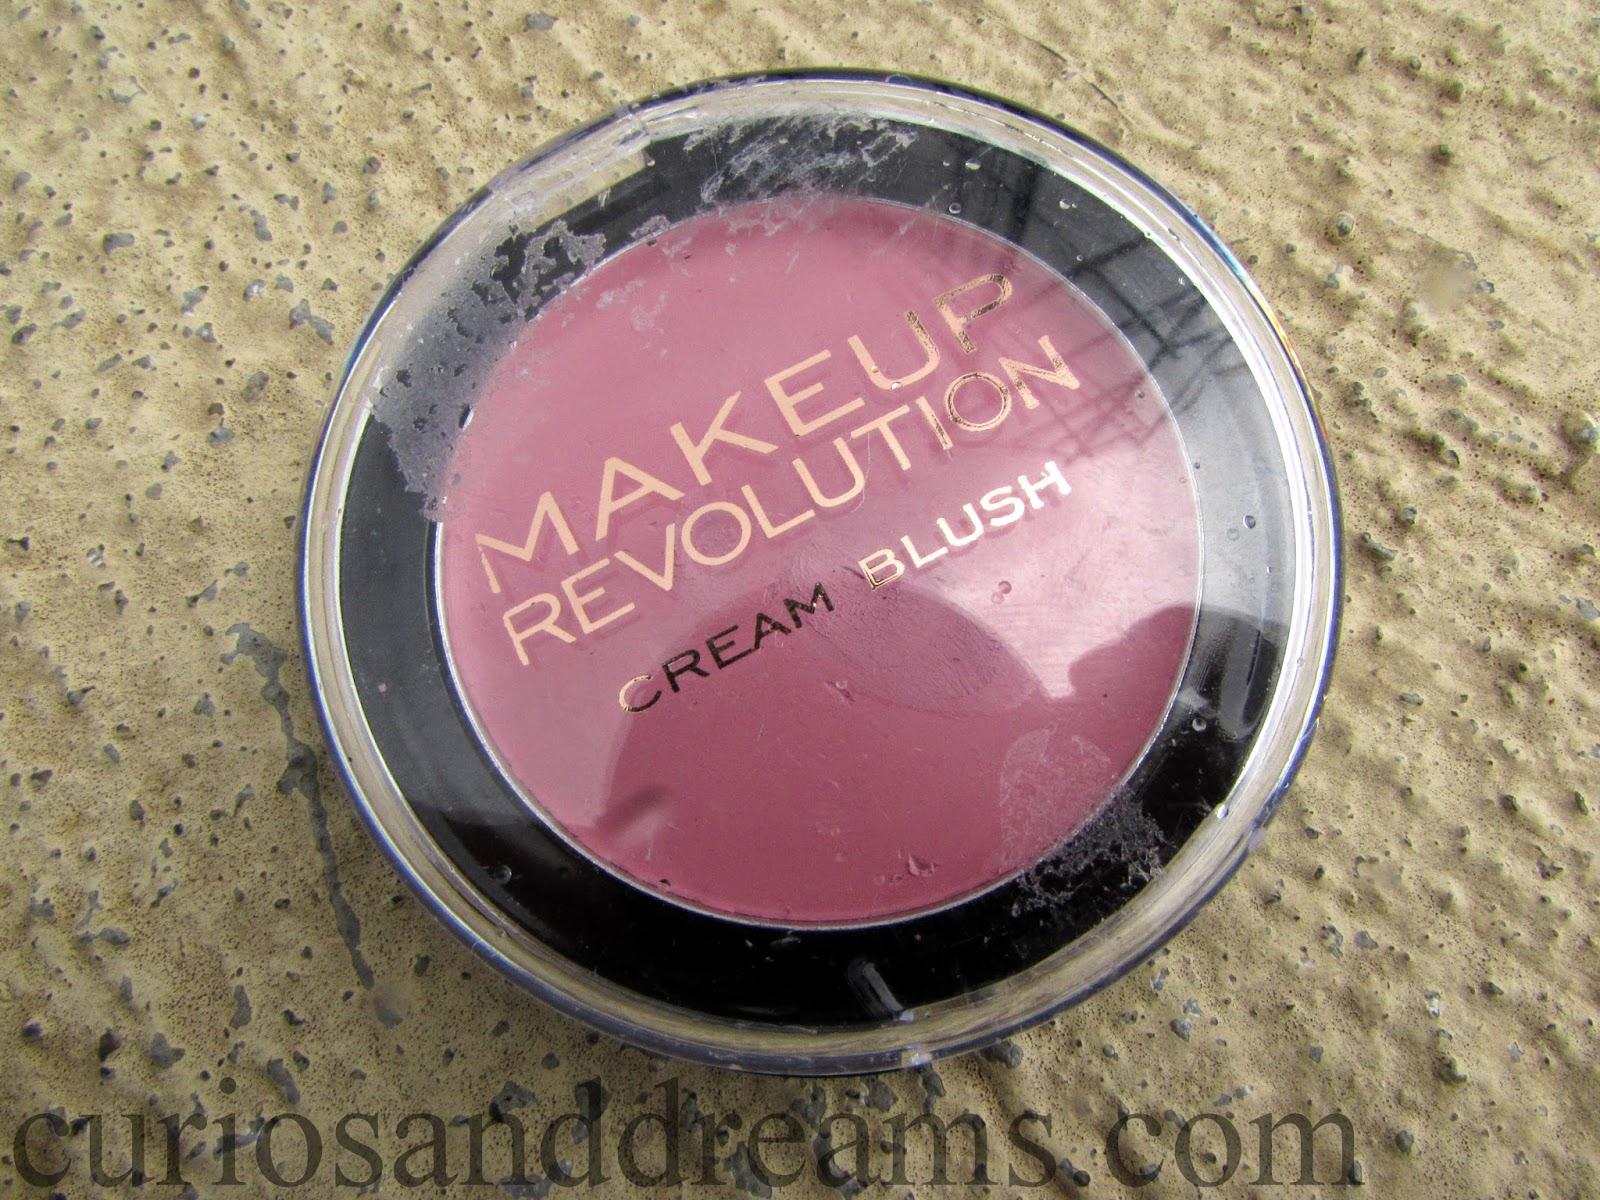 Makeup Revolution Cream Blusher review, Makeup Revolution Framboise Shake review